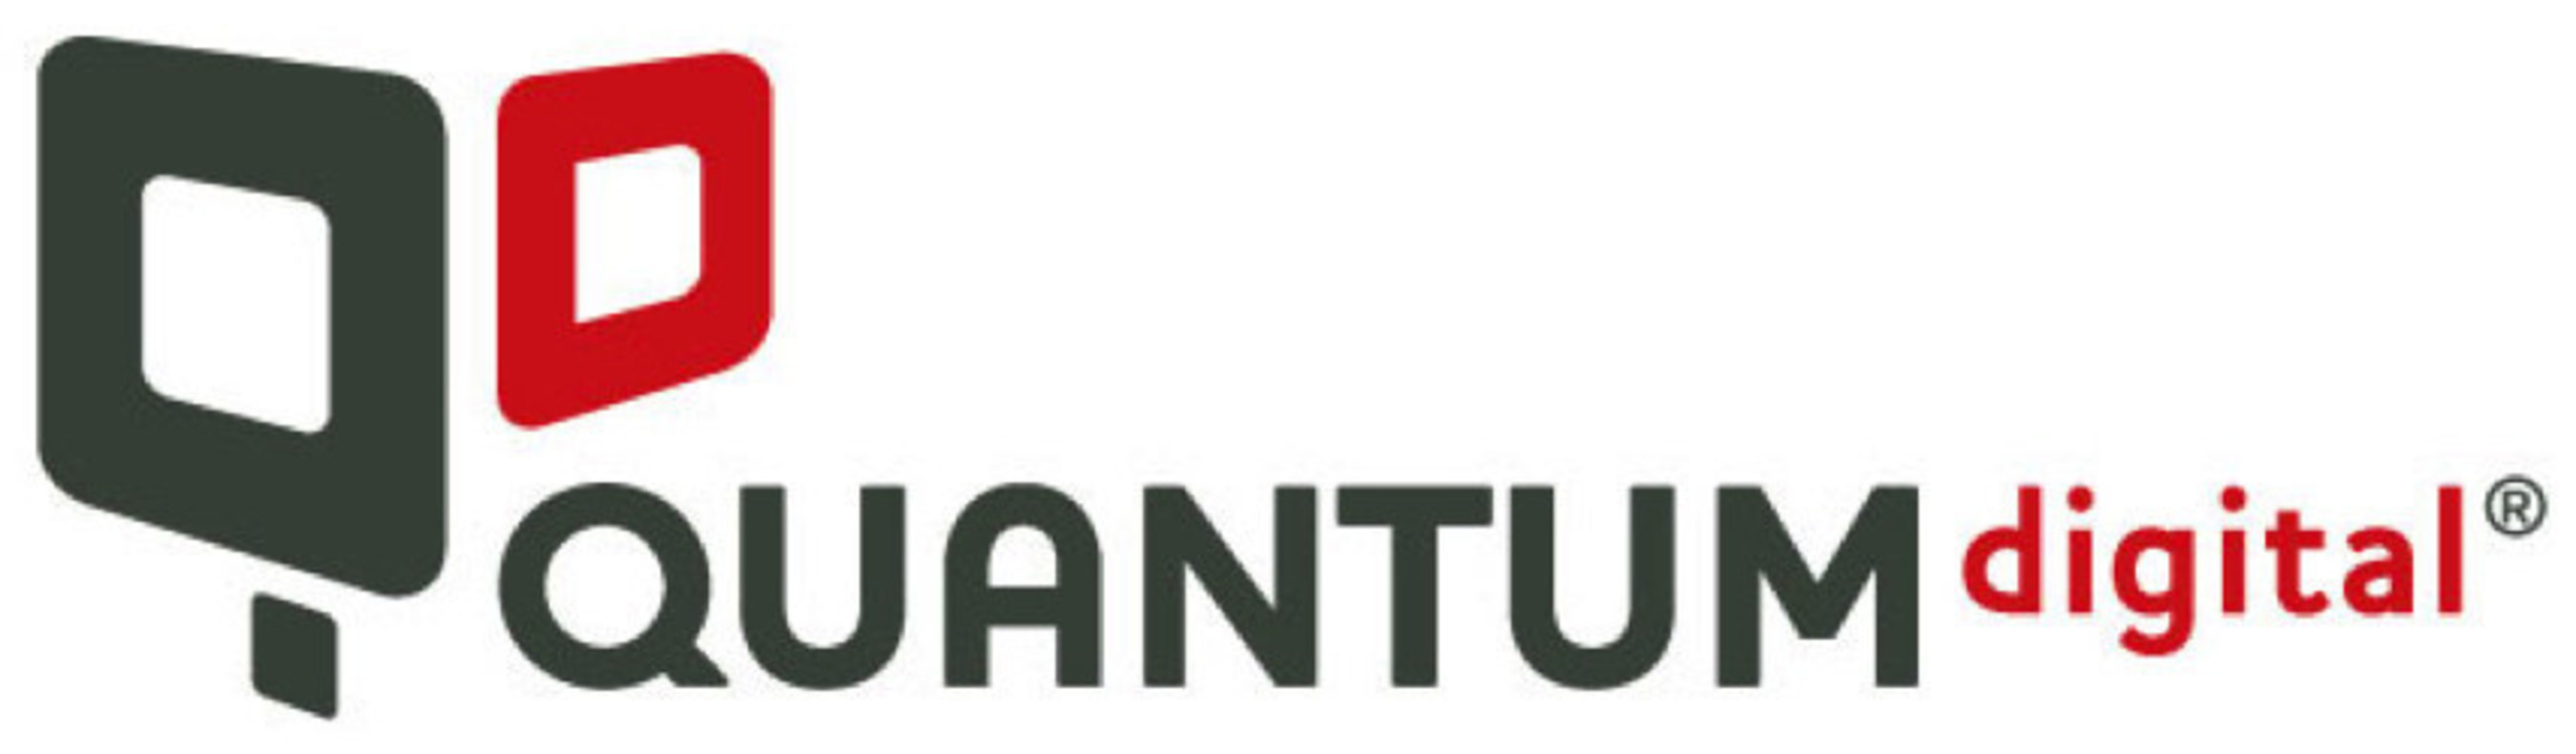 QuantumDigital Releases TriggerMarketing Social